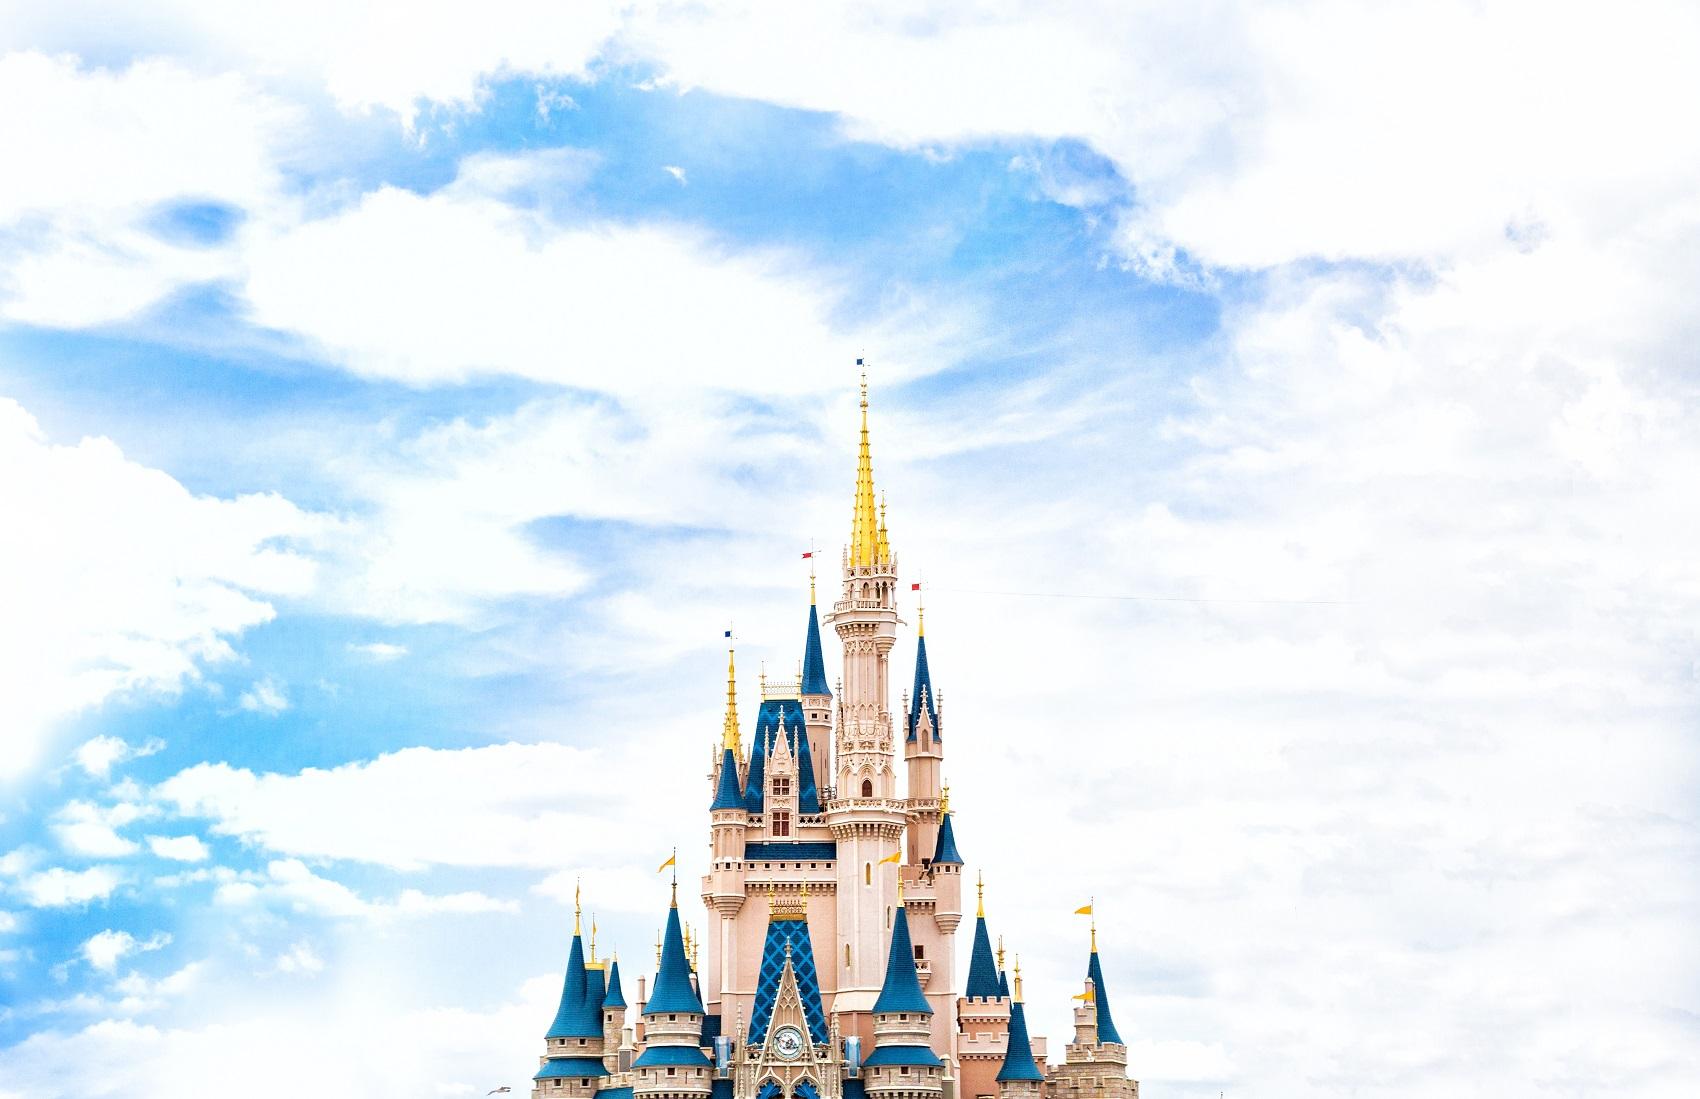 walt-disney-world-castle-orlando